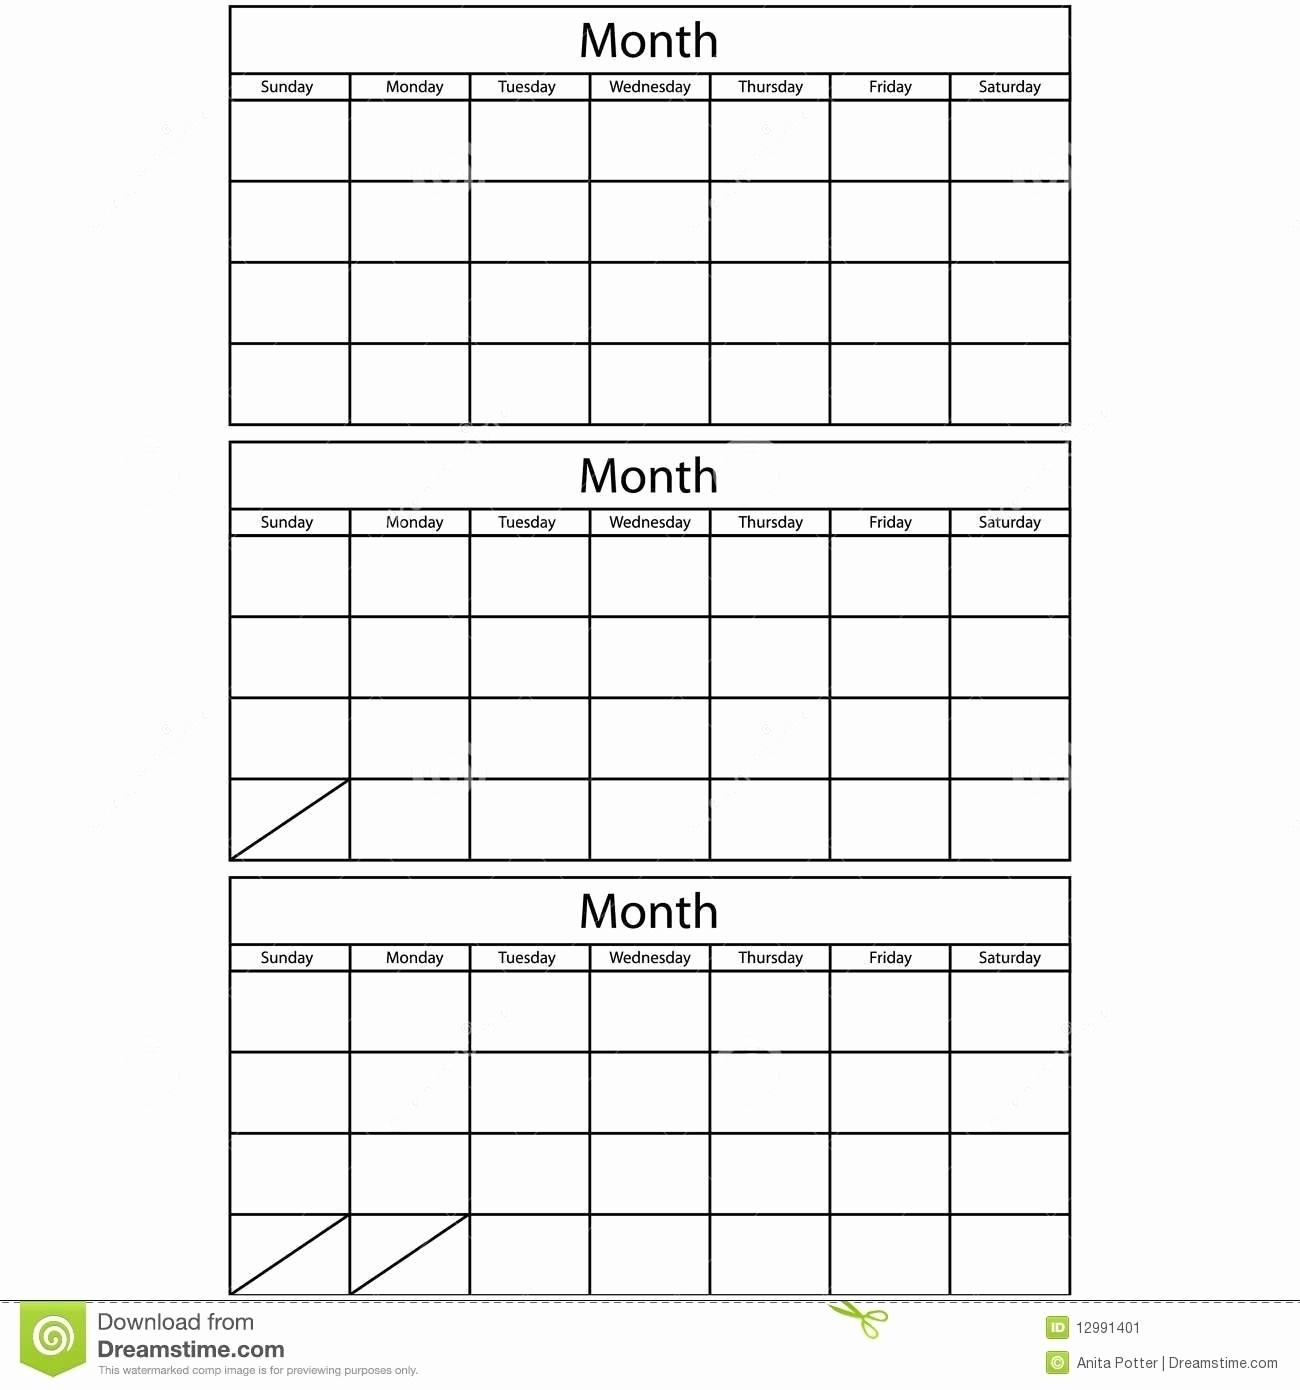 3 Month Planning Calendar Printable  Calendar Inspiration intended for Printable Calendar 3 Month